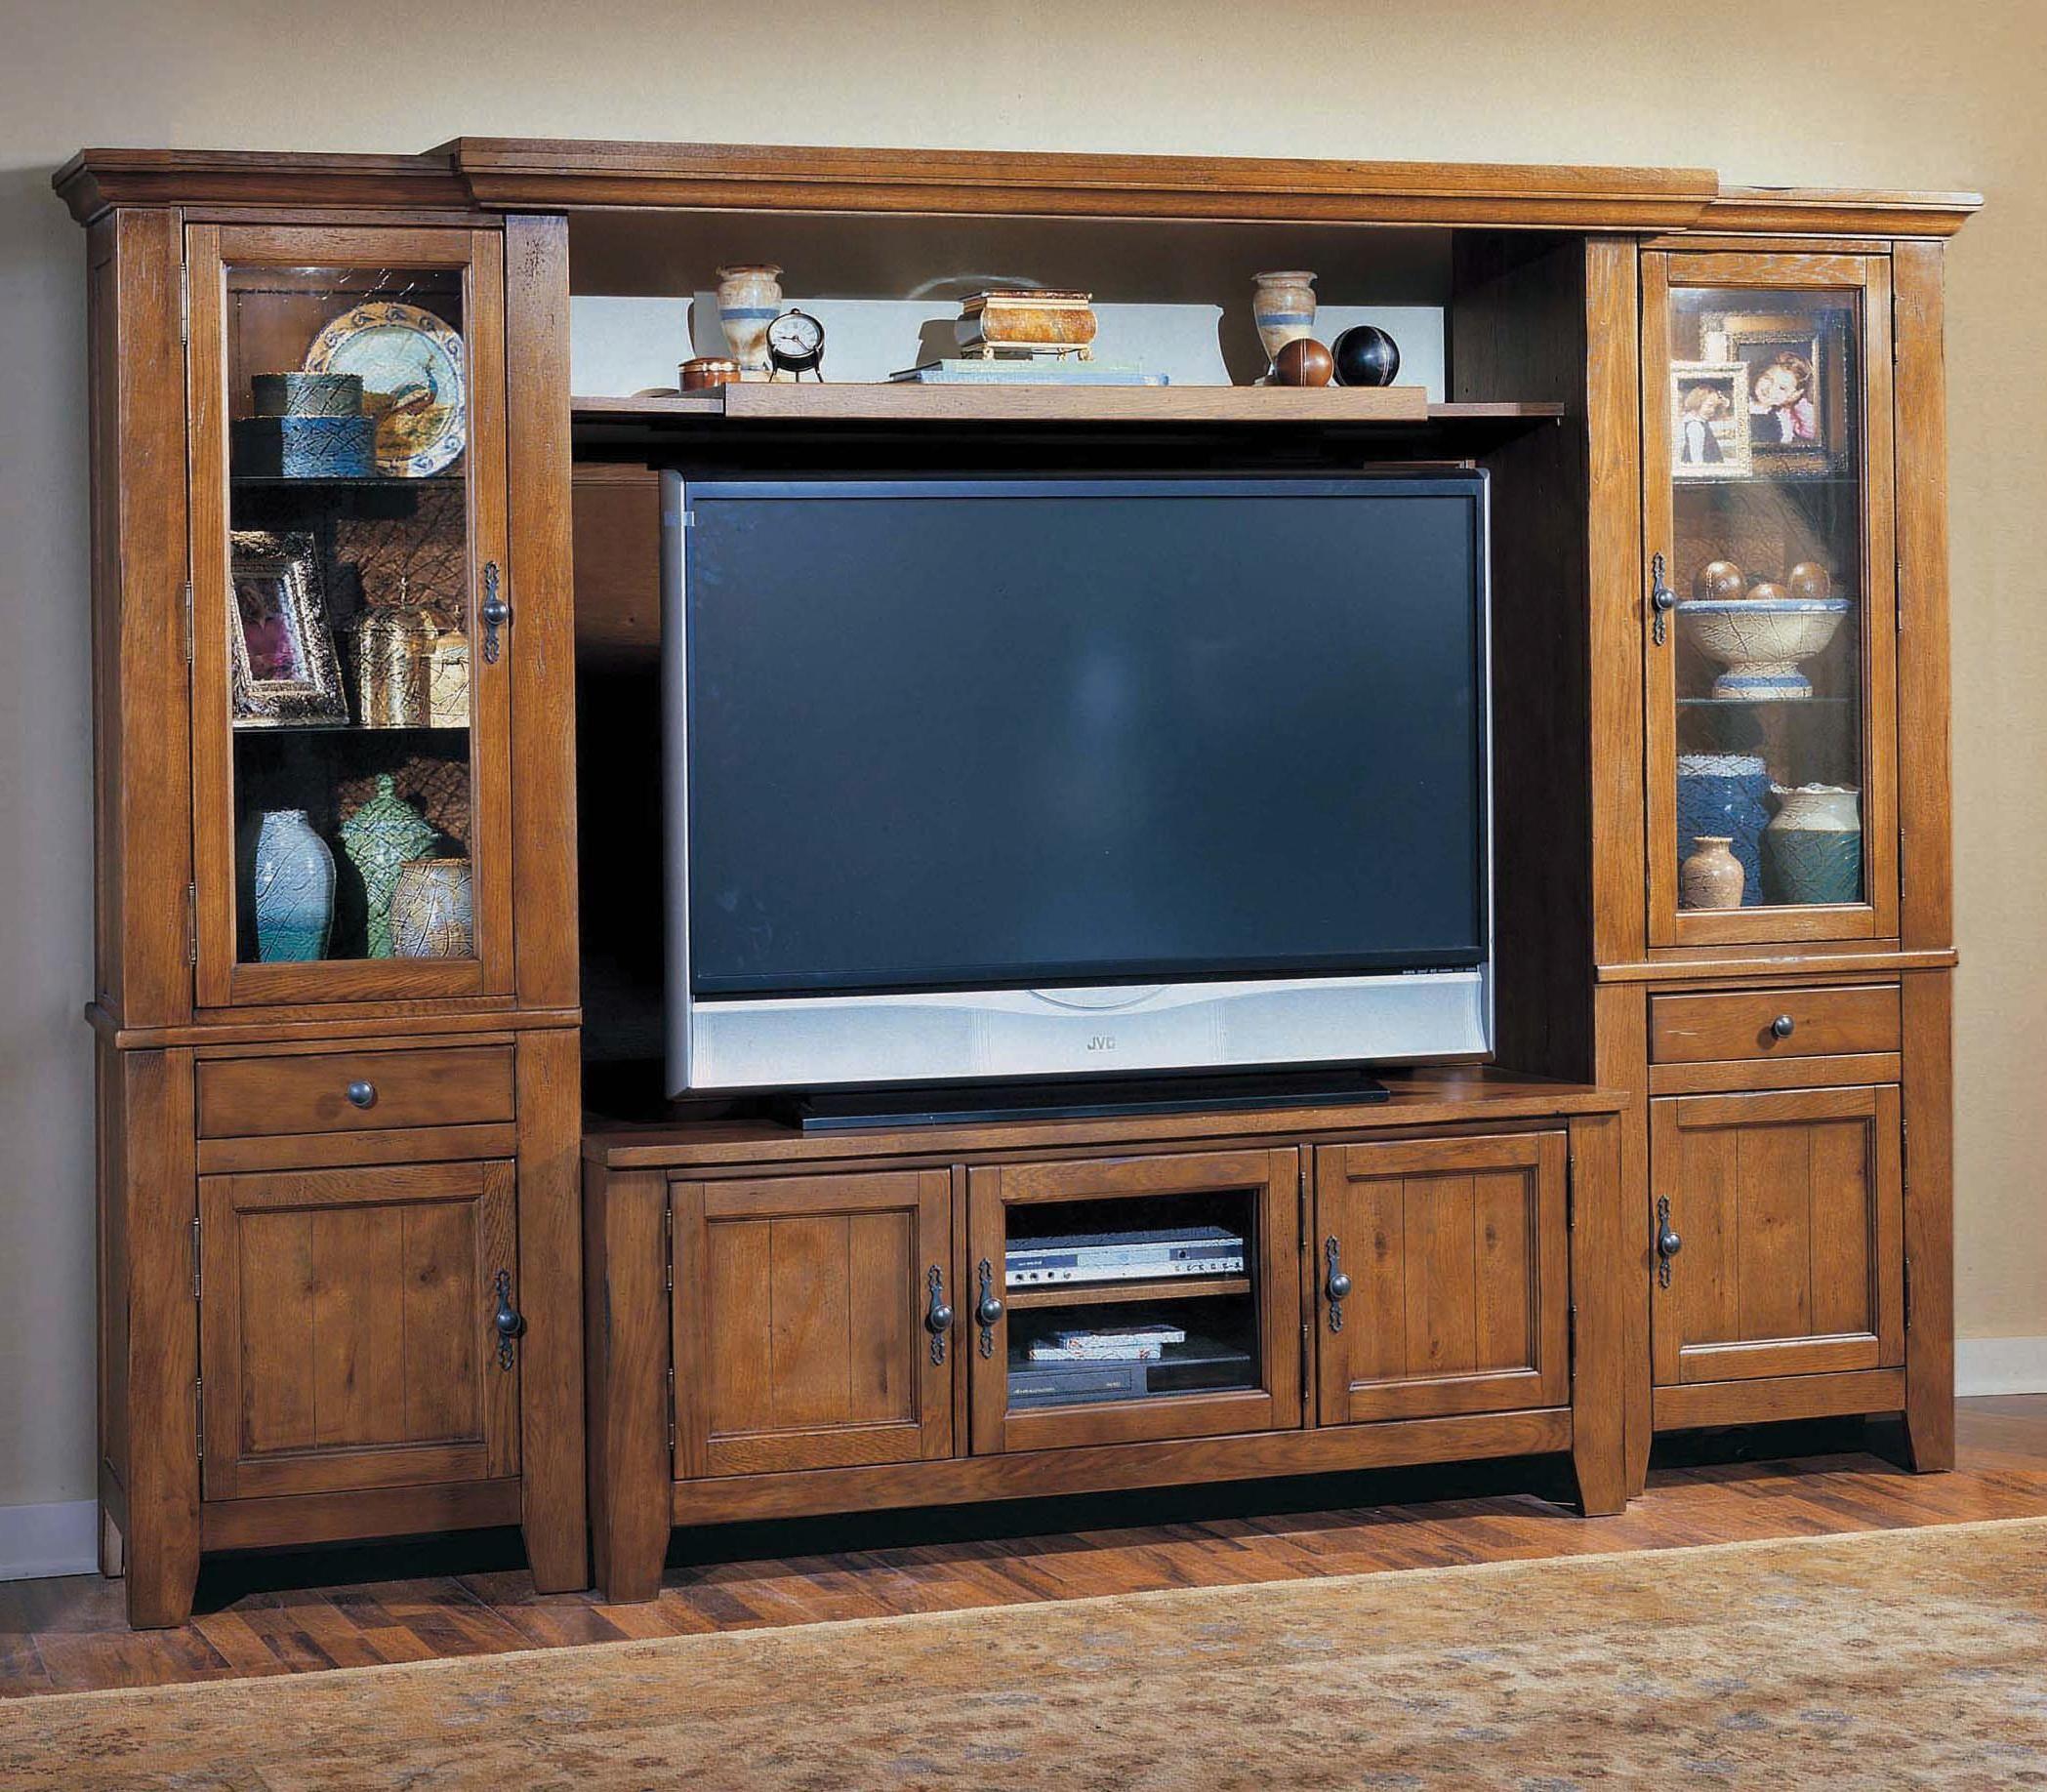 broyhill sofa nebraska furniture mart american leather full sleeper attic heirlooms entertainment wall by